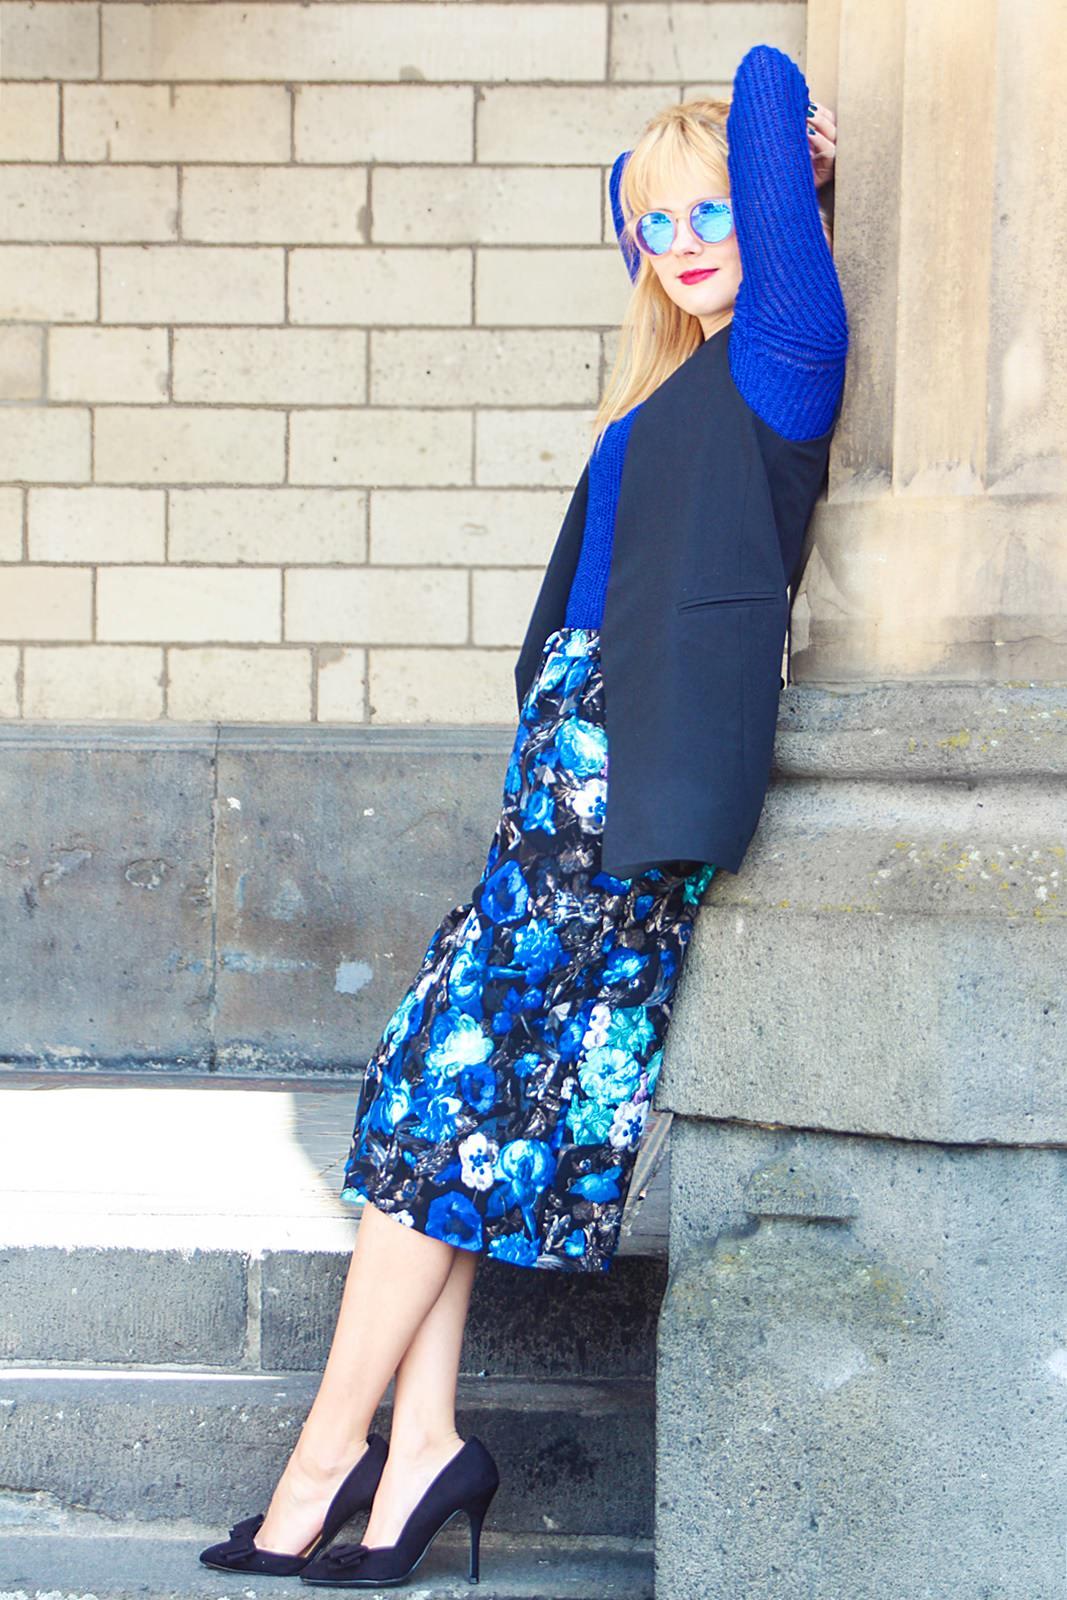 Des Belles Choses_Culotte_Floral Spring Trend 7